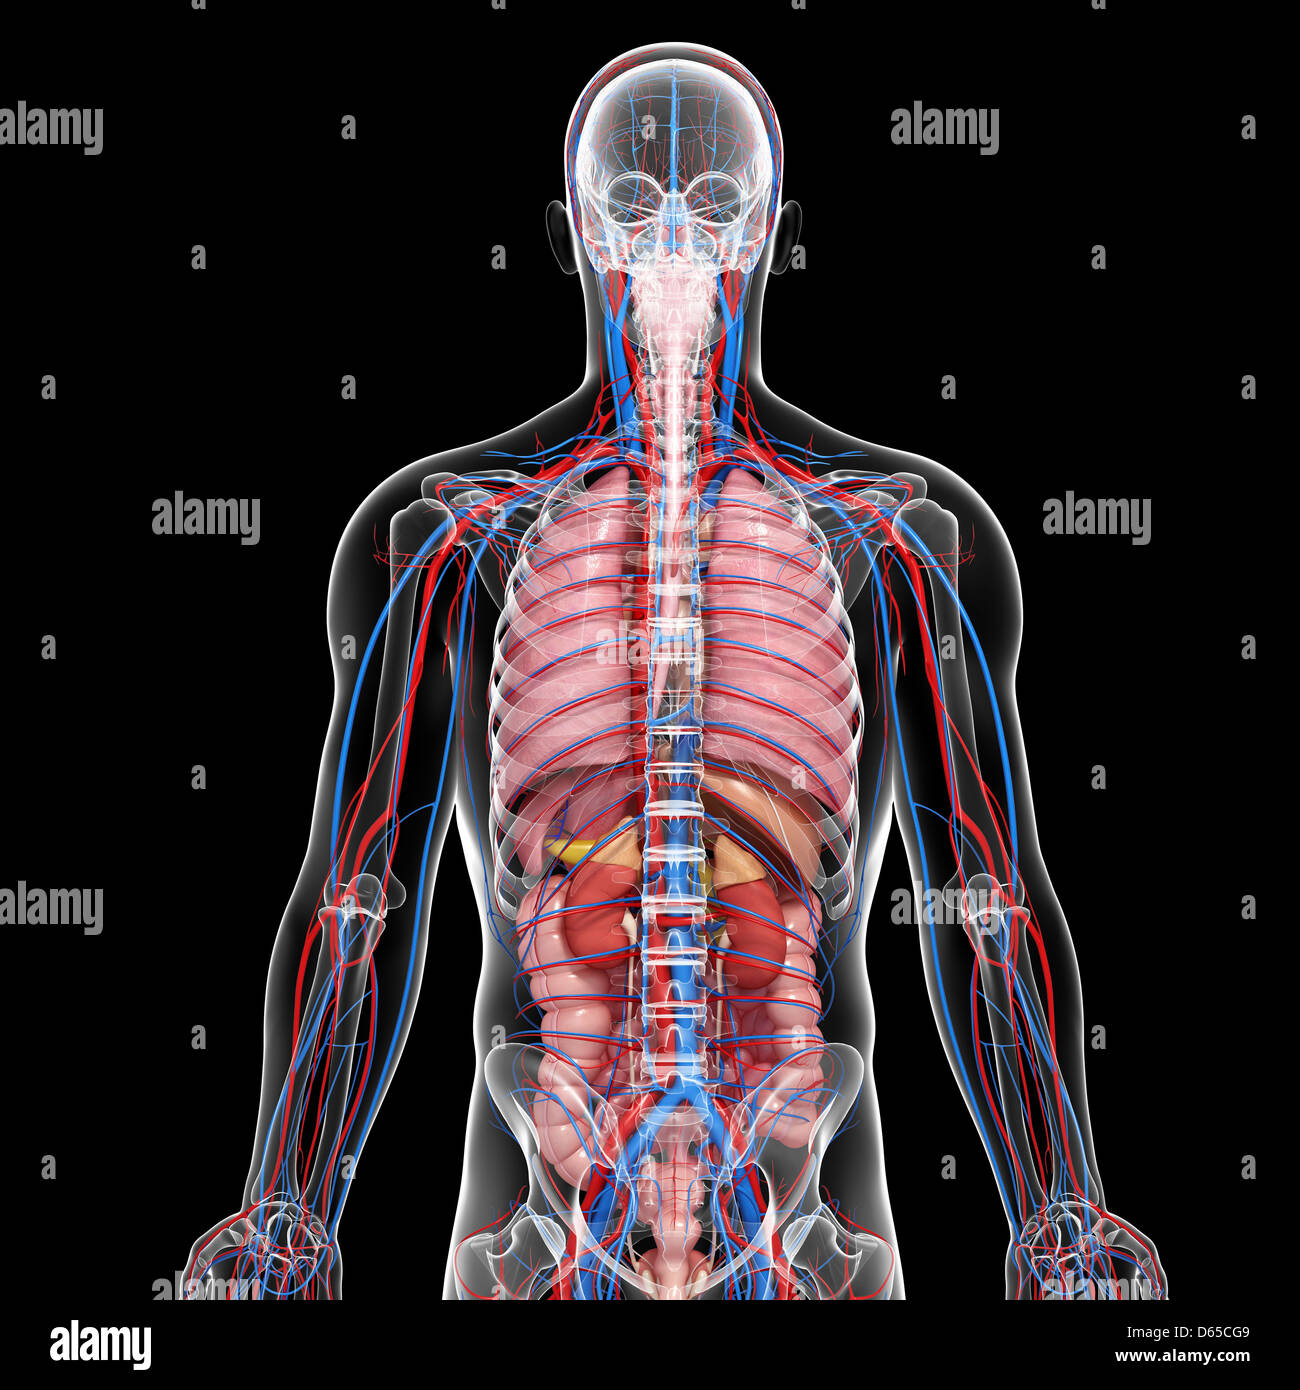 Human Kidney Anatomy Adrenal Gland Stock Photos Human Kidney